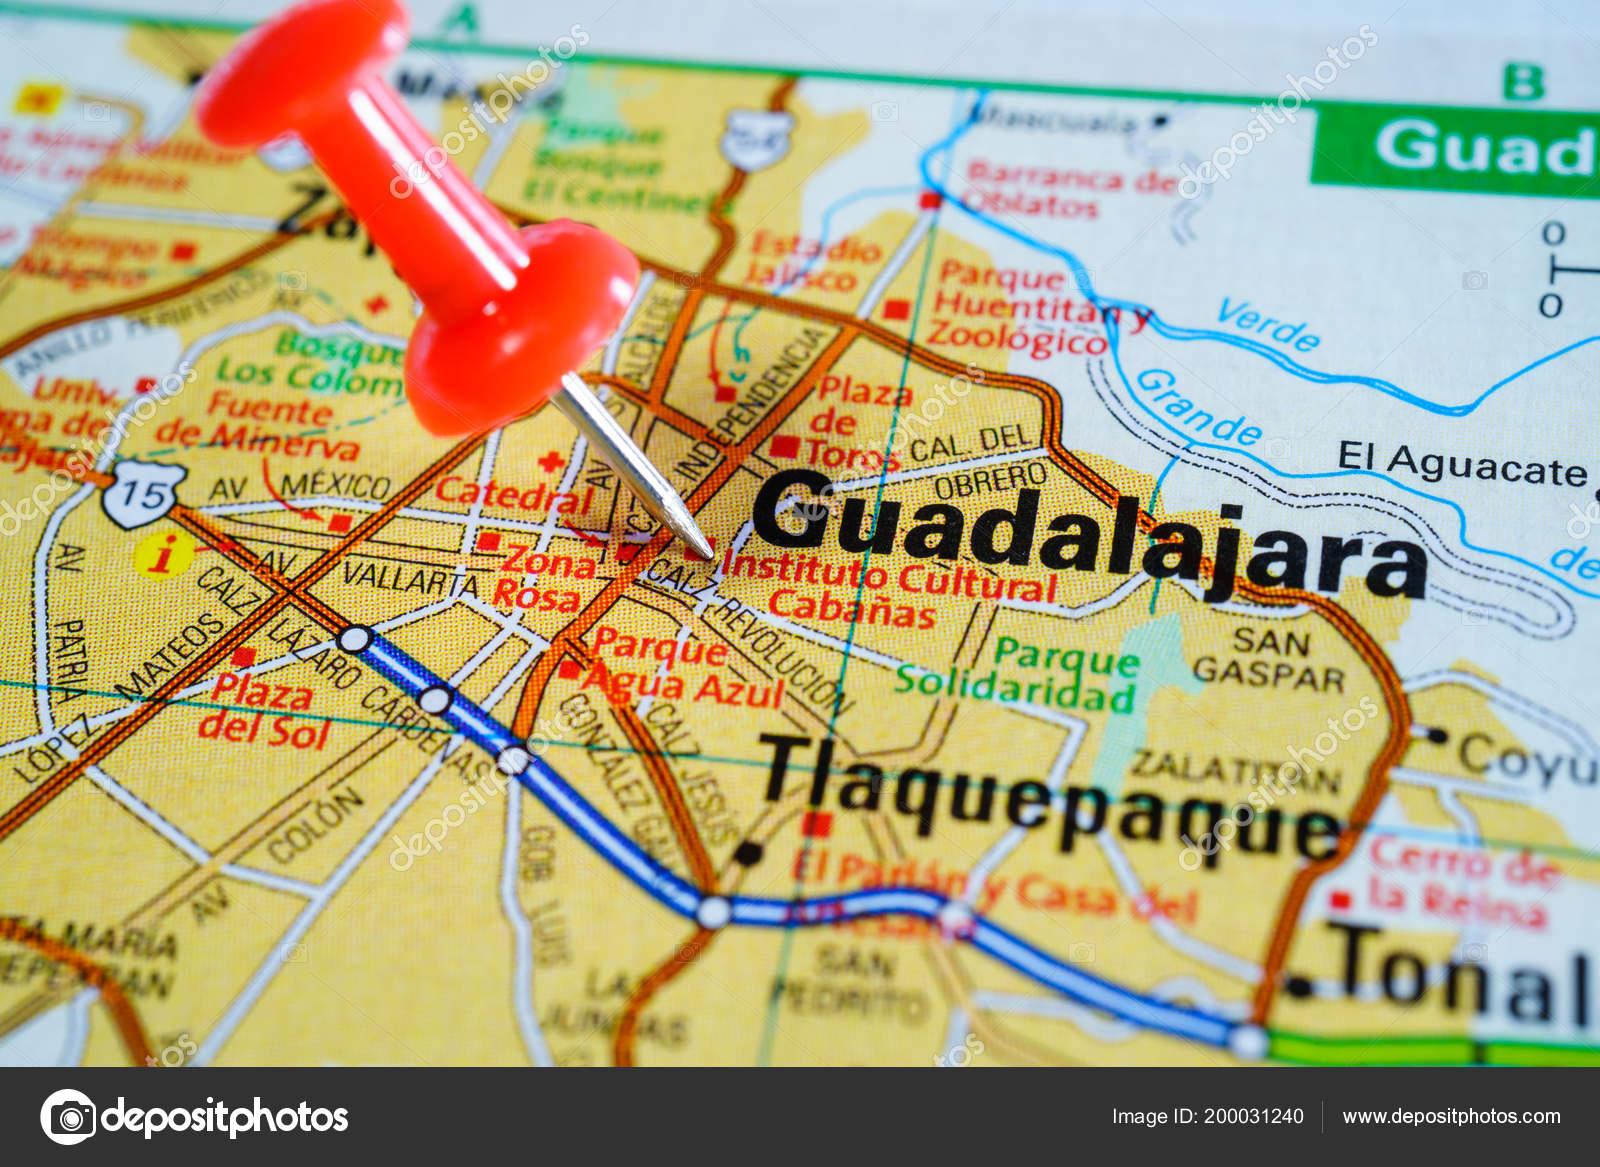 Guadalajara Mexico Mapa Foto De Stock C Aallm 200031240